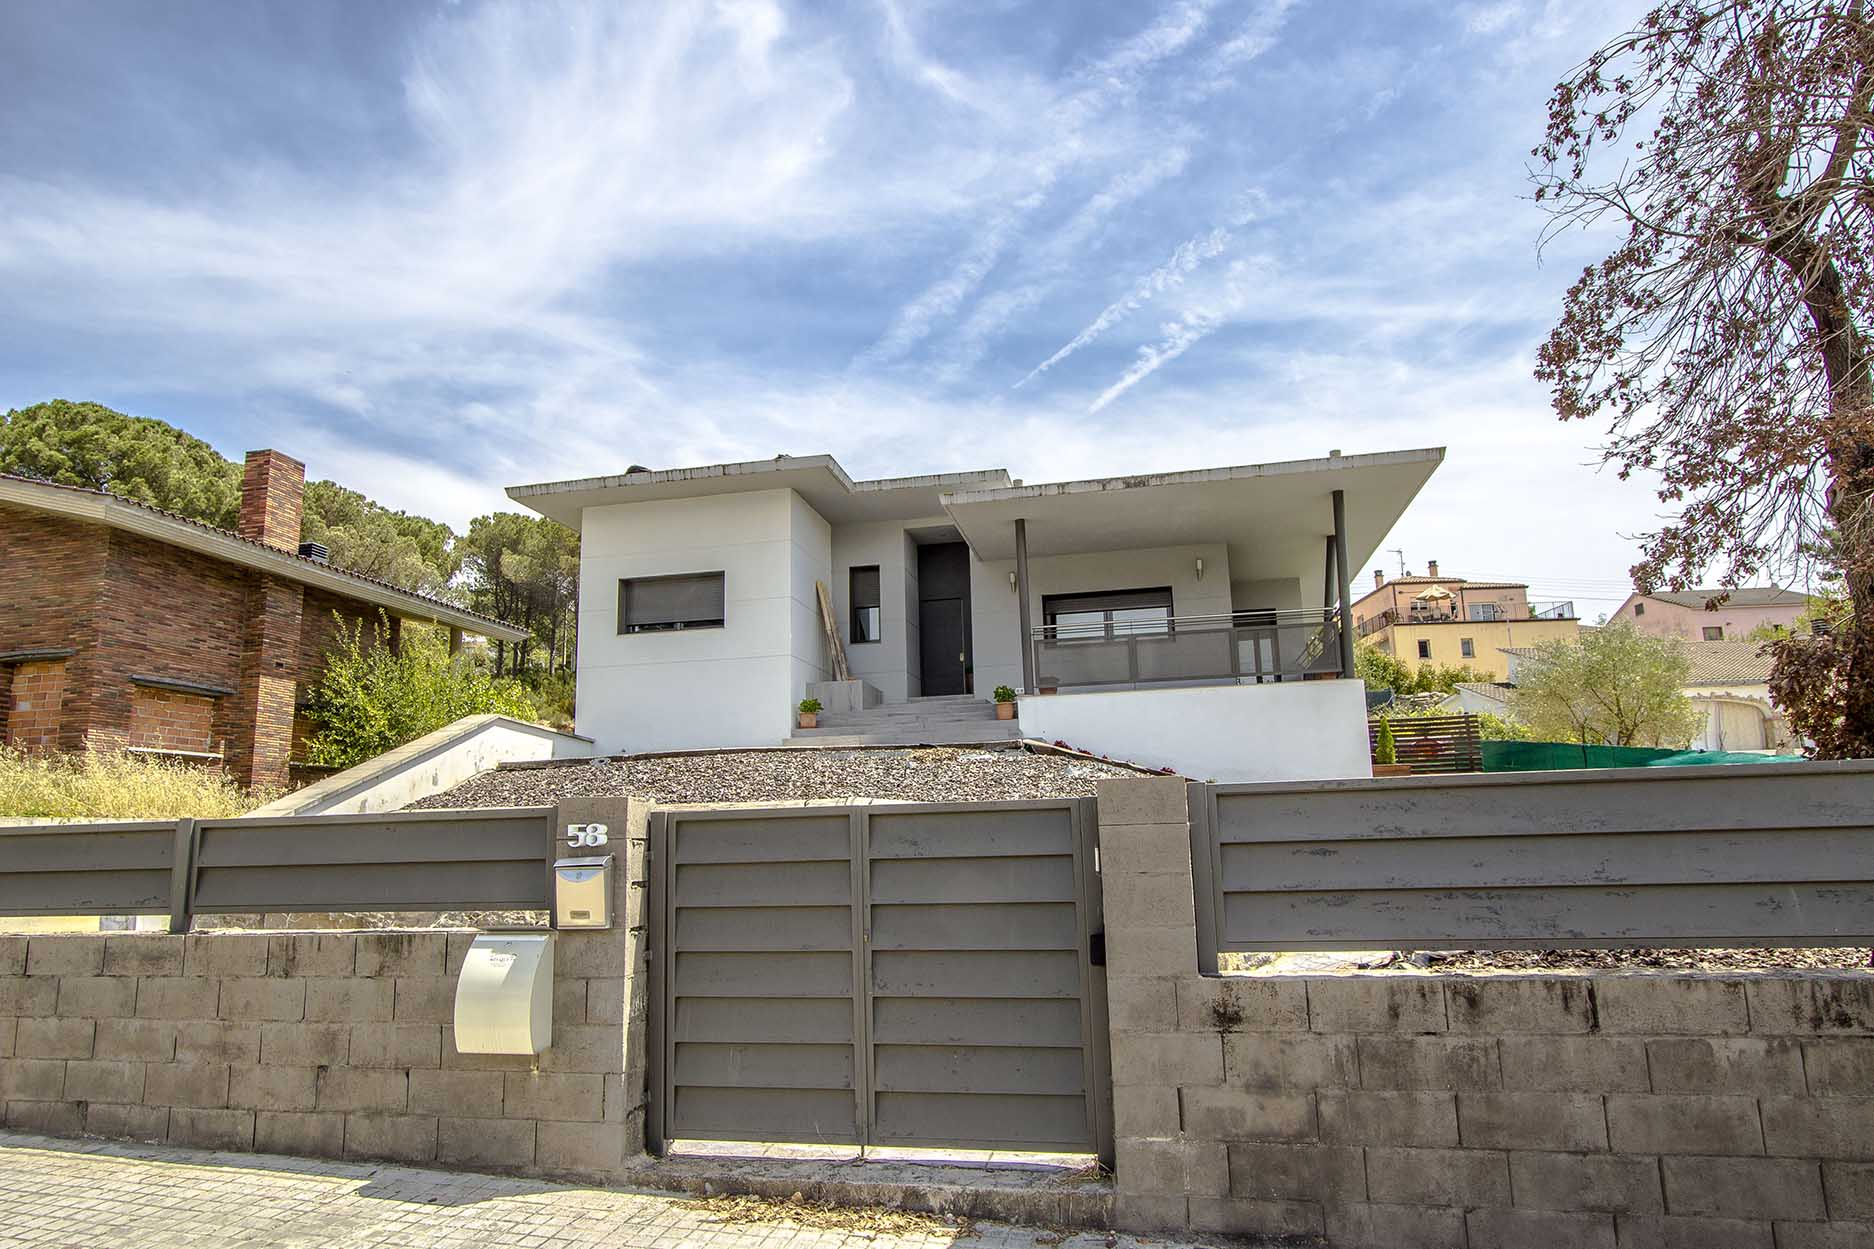 Ferienhaus Catalunya Casas: Modern villa in Sils, 15 min drive to Costa Brava beaches! (1902227), Les Mallorquines, Girona, Katalonien, Spanien, Bild 27